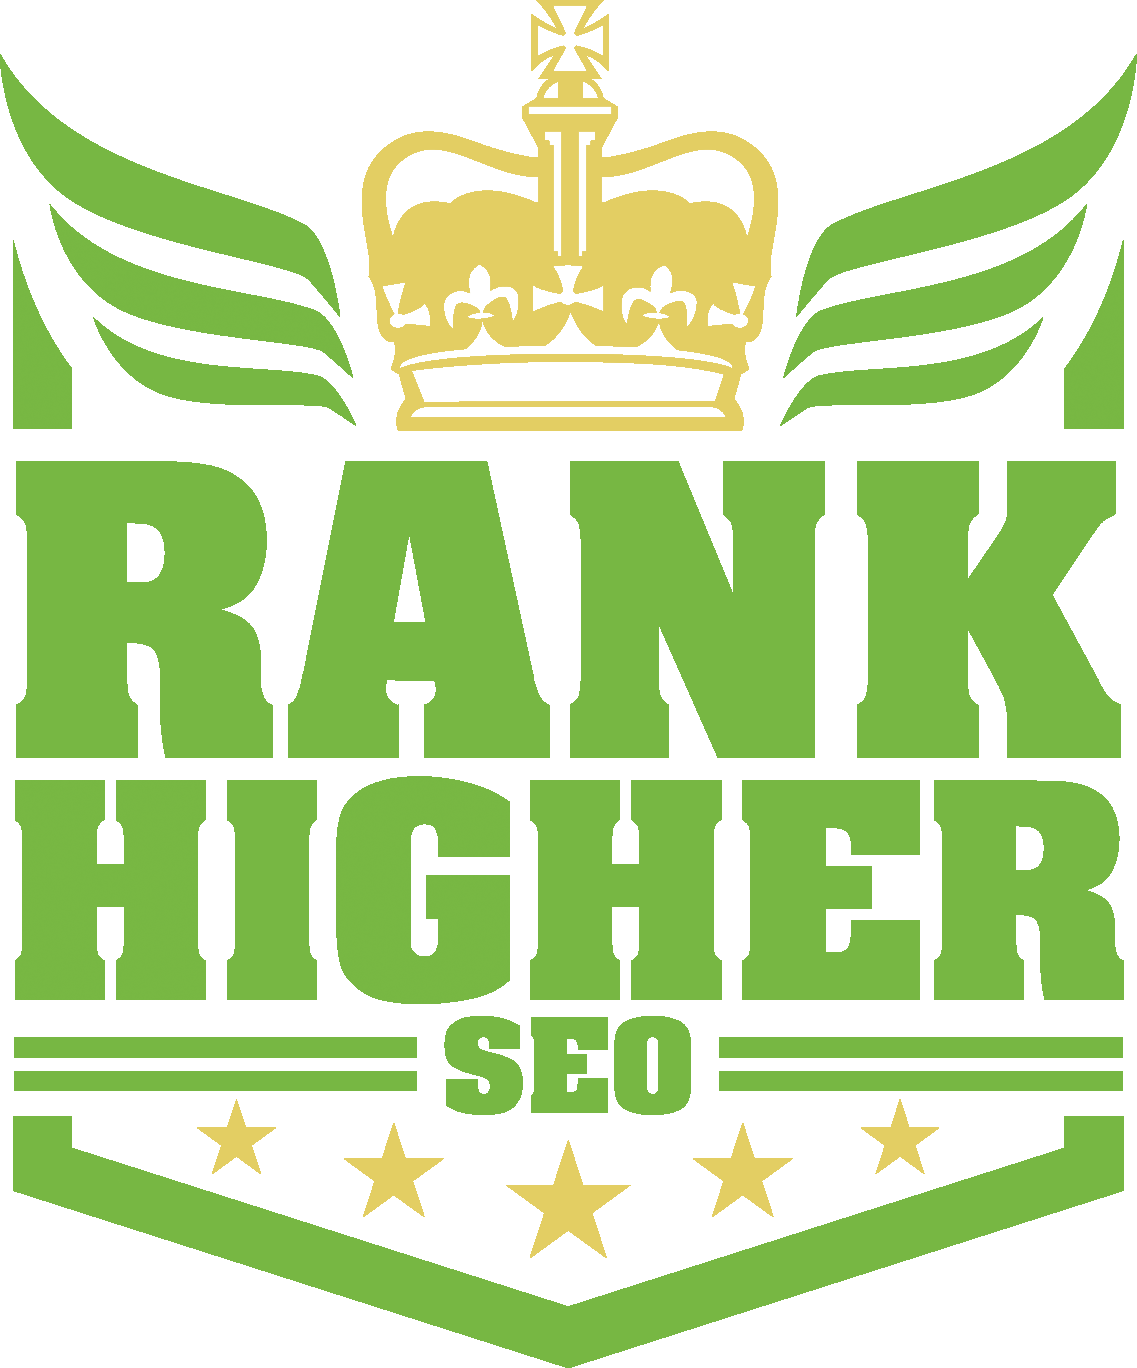 Rank Higher SEO